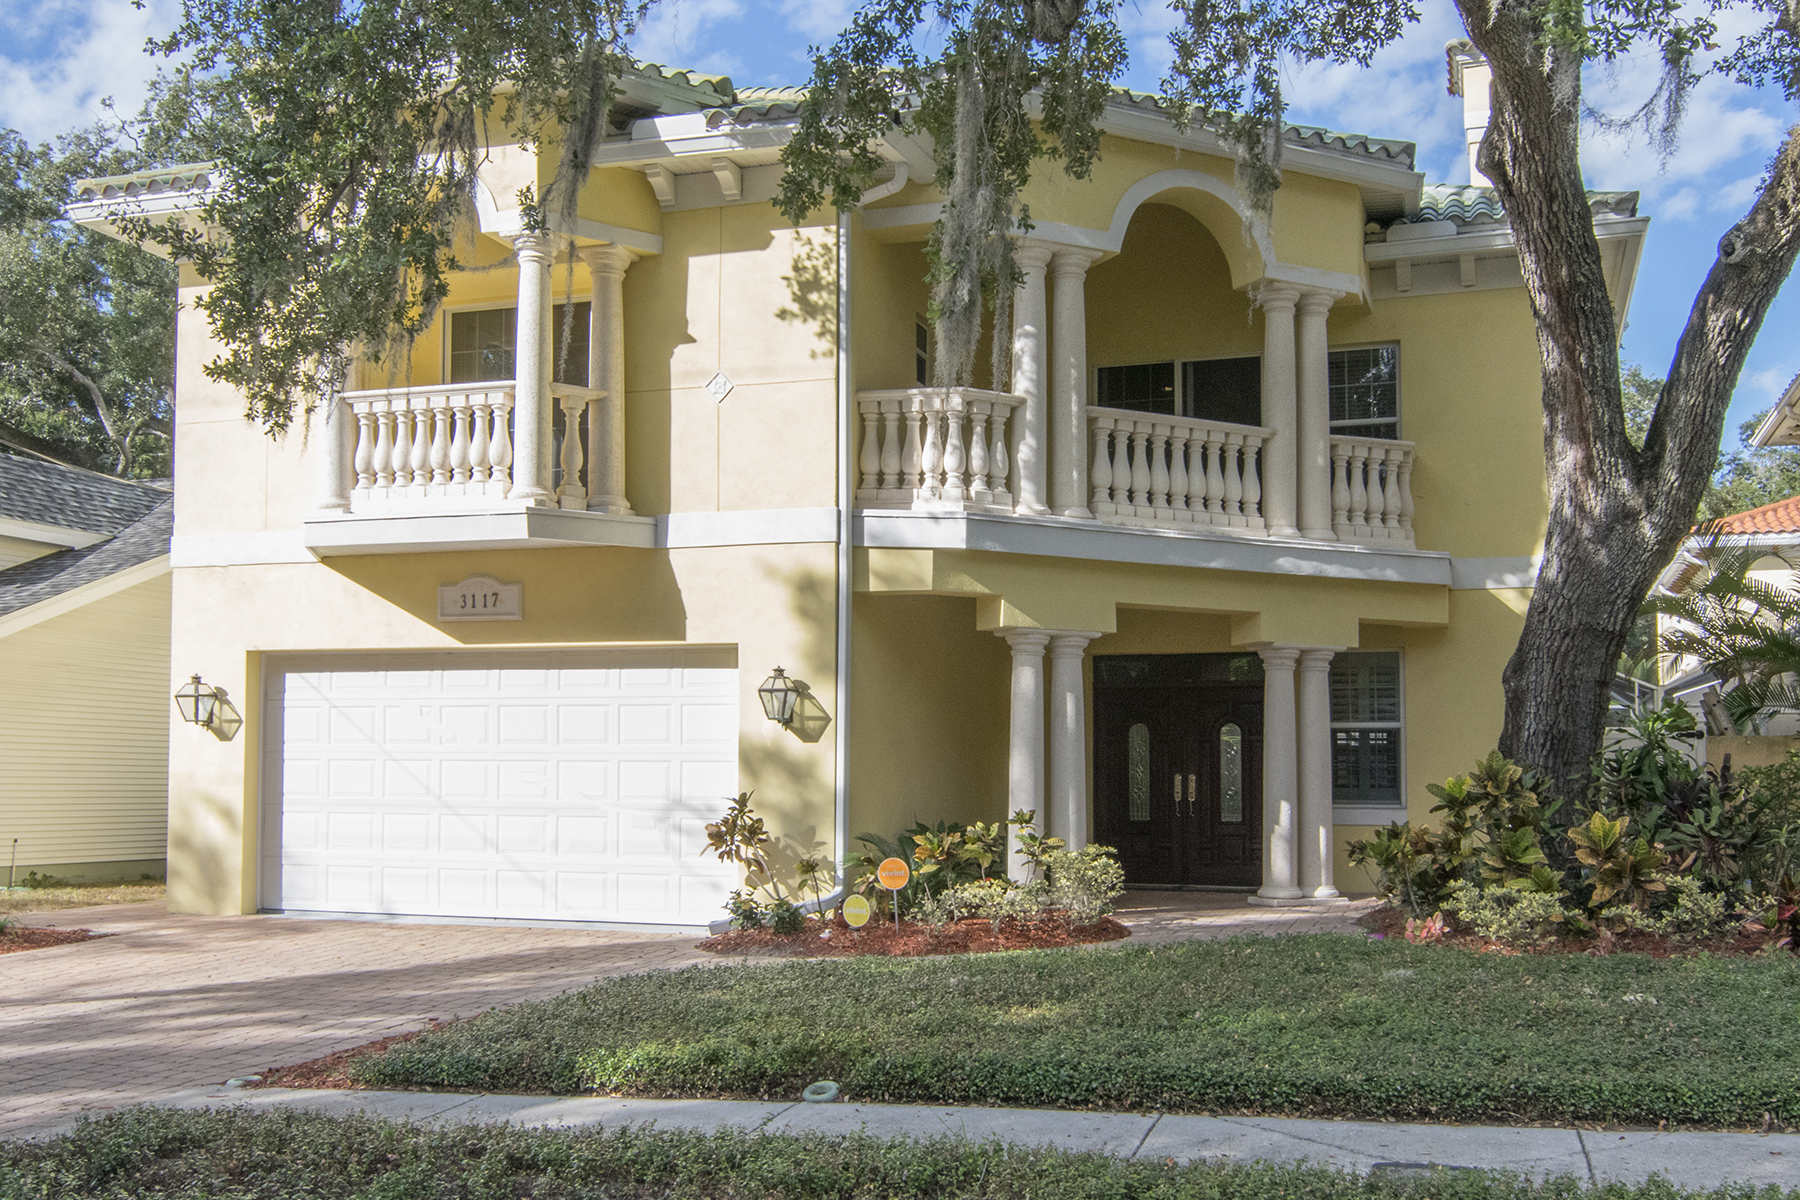 Moradia para Venda às SOUTH TAMPA 3117 W Villa Rosa St Tampa, Florida, 33611 Estados Unidos